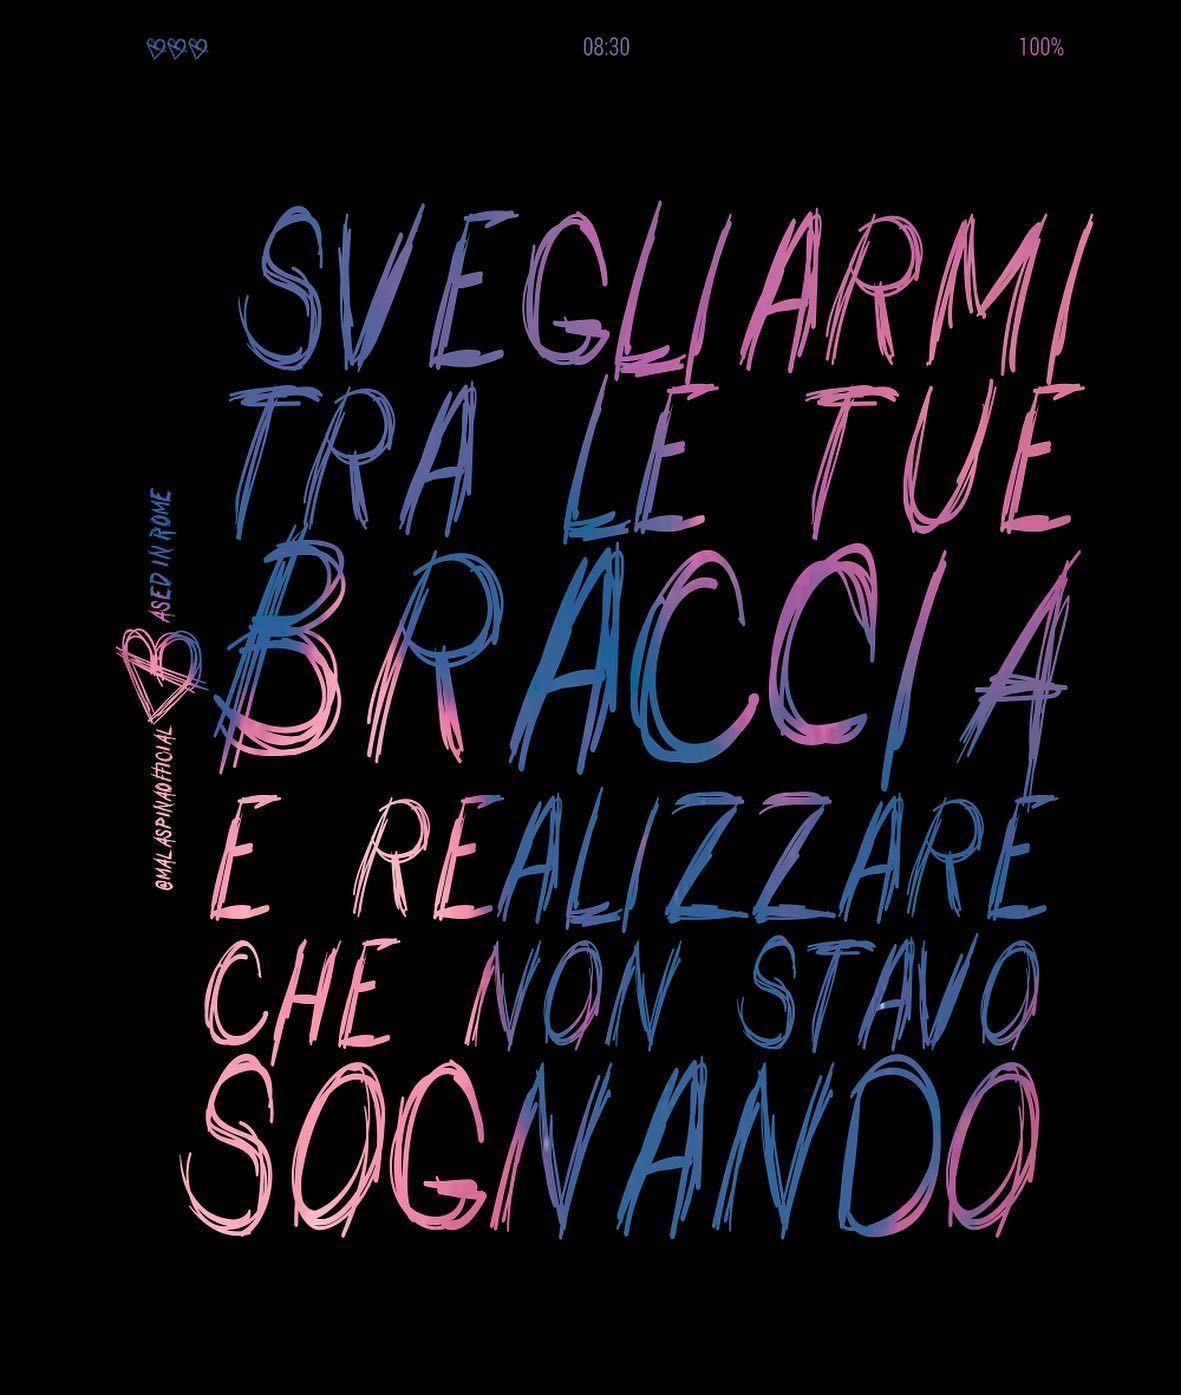 ❤️🥰 @malaspinaofficial . #malaspina #malaspinaofficial #essere #frasibellissime #citazioni #aforisma #aforismi #pensieri #frasidamore #tivogliobene #frasi #frasitop #frasibelle #frasitumblr #frasivere #frasiitaliane #frasisignificative #citazione #felicità #pensiero #vita #amore #tiamo #mente #tumblr #frasiitaliane #mimanchi #amicizia